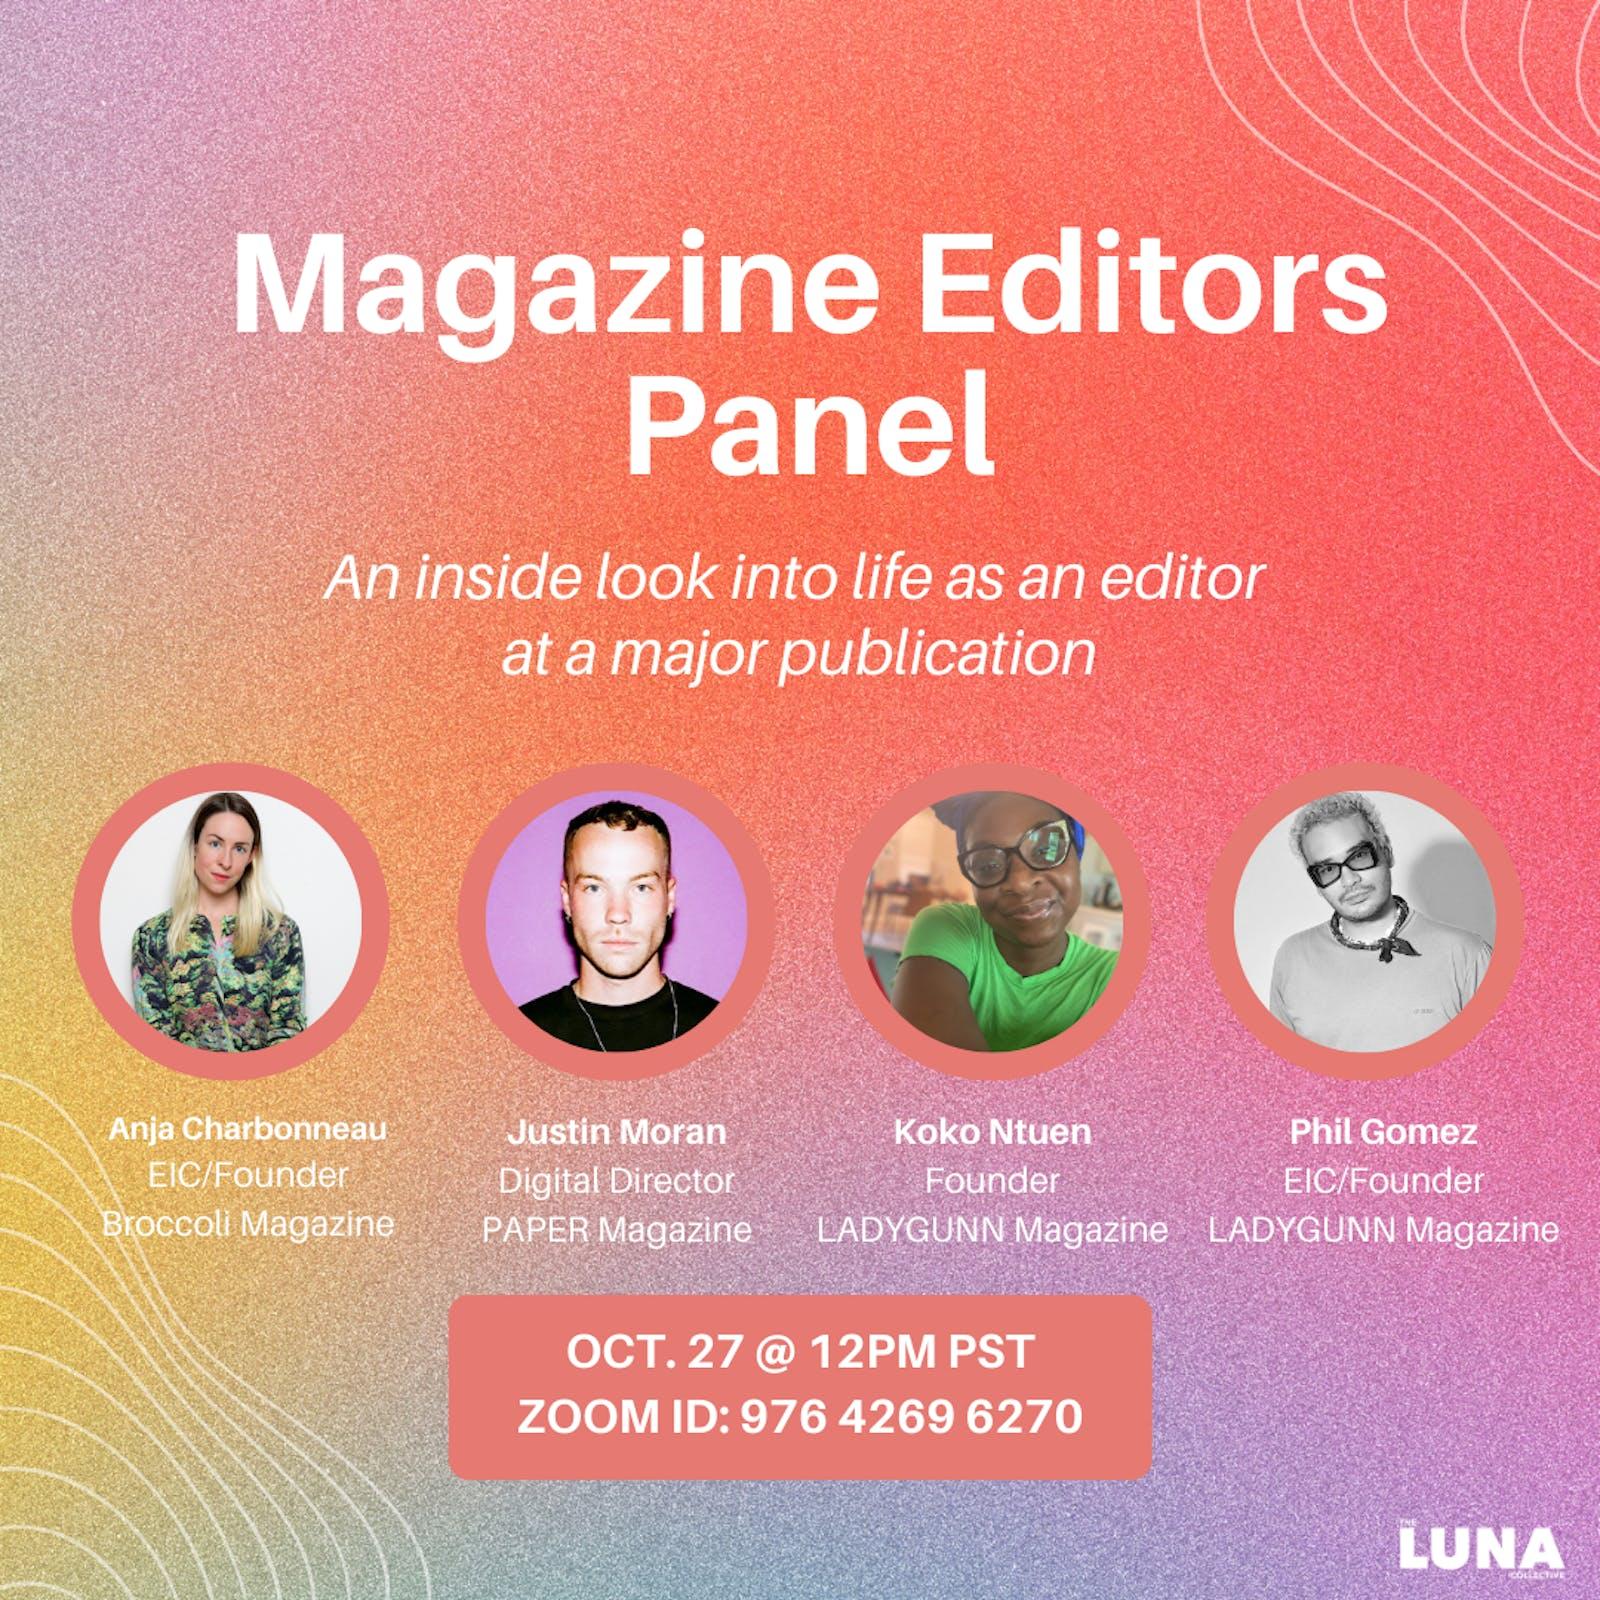 Magazine Editors Panel